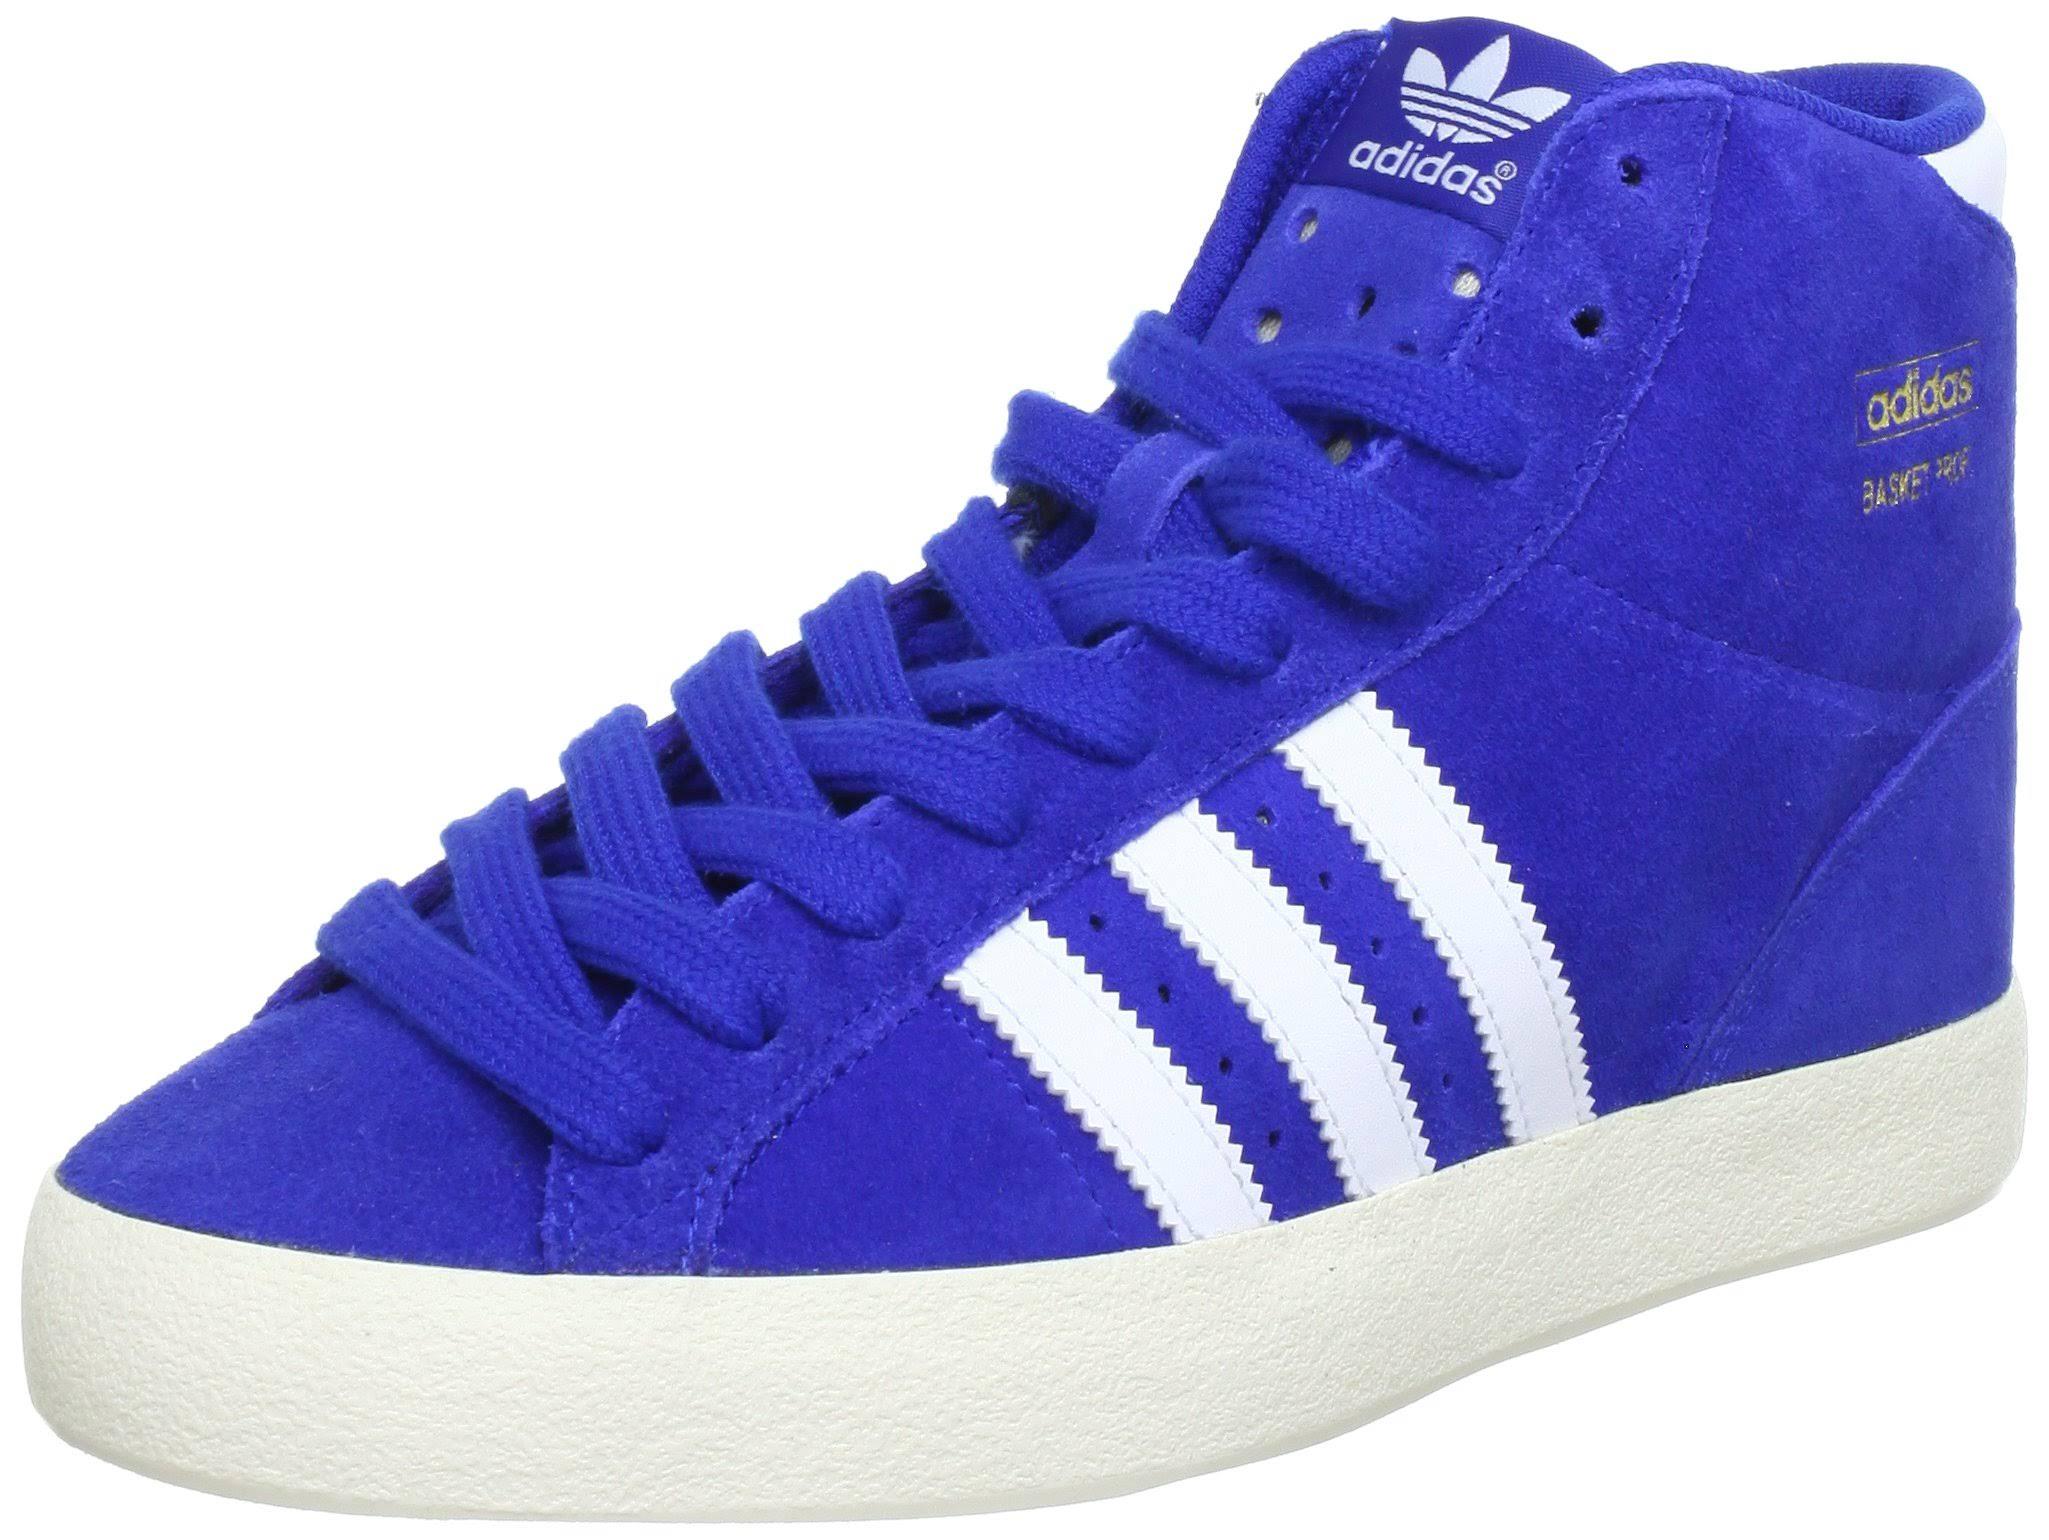 ecru Sneaker Blau 11 Profi White Blue Q23334 46 true Basket Herren running Ftw Eu uk ZwvnpqnT